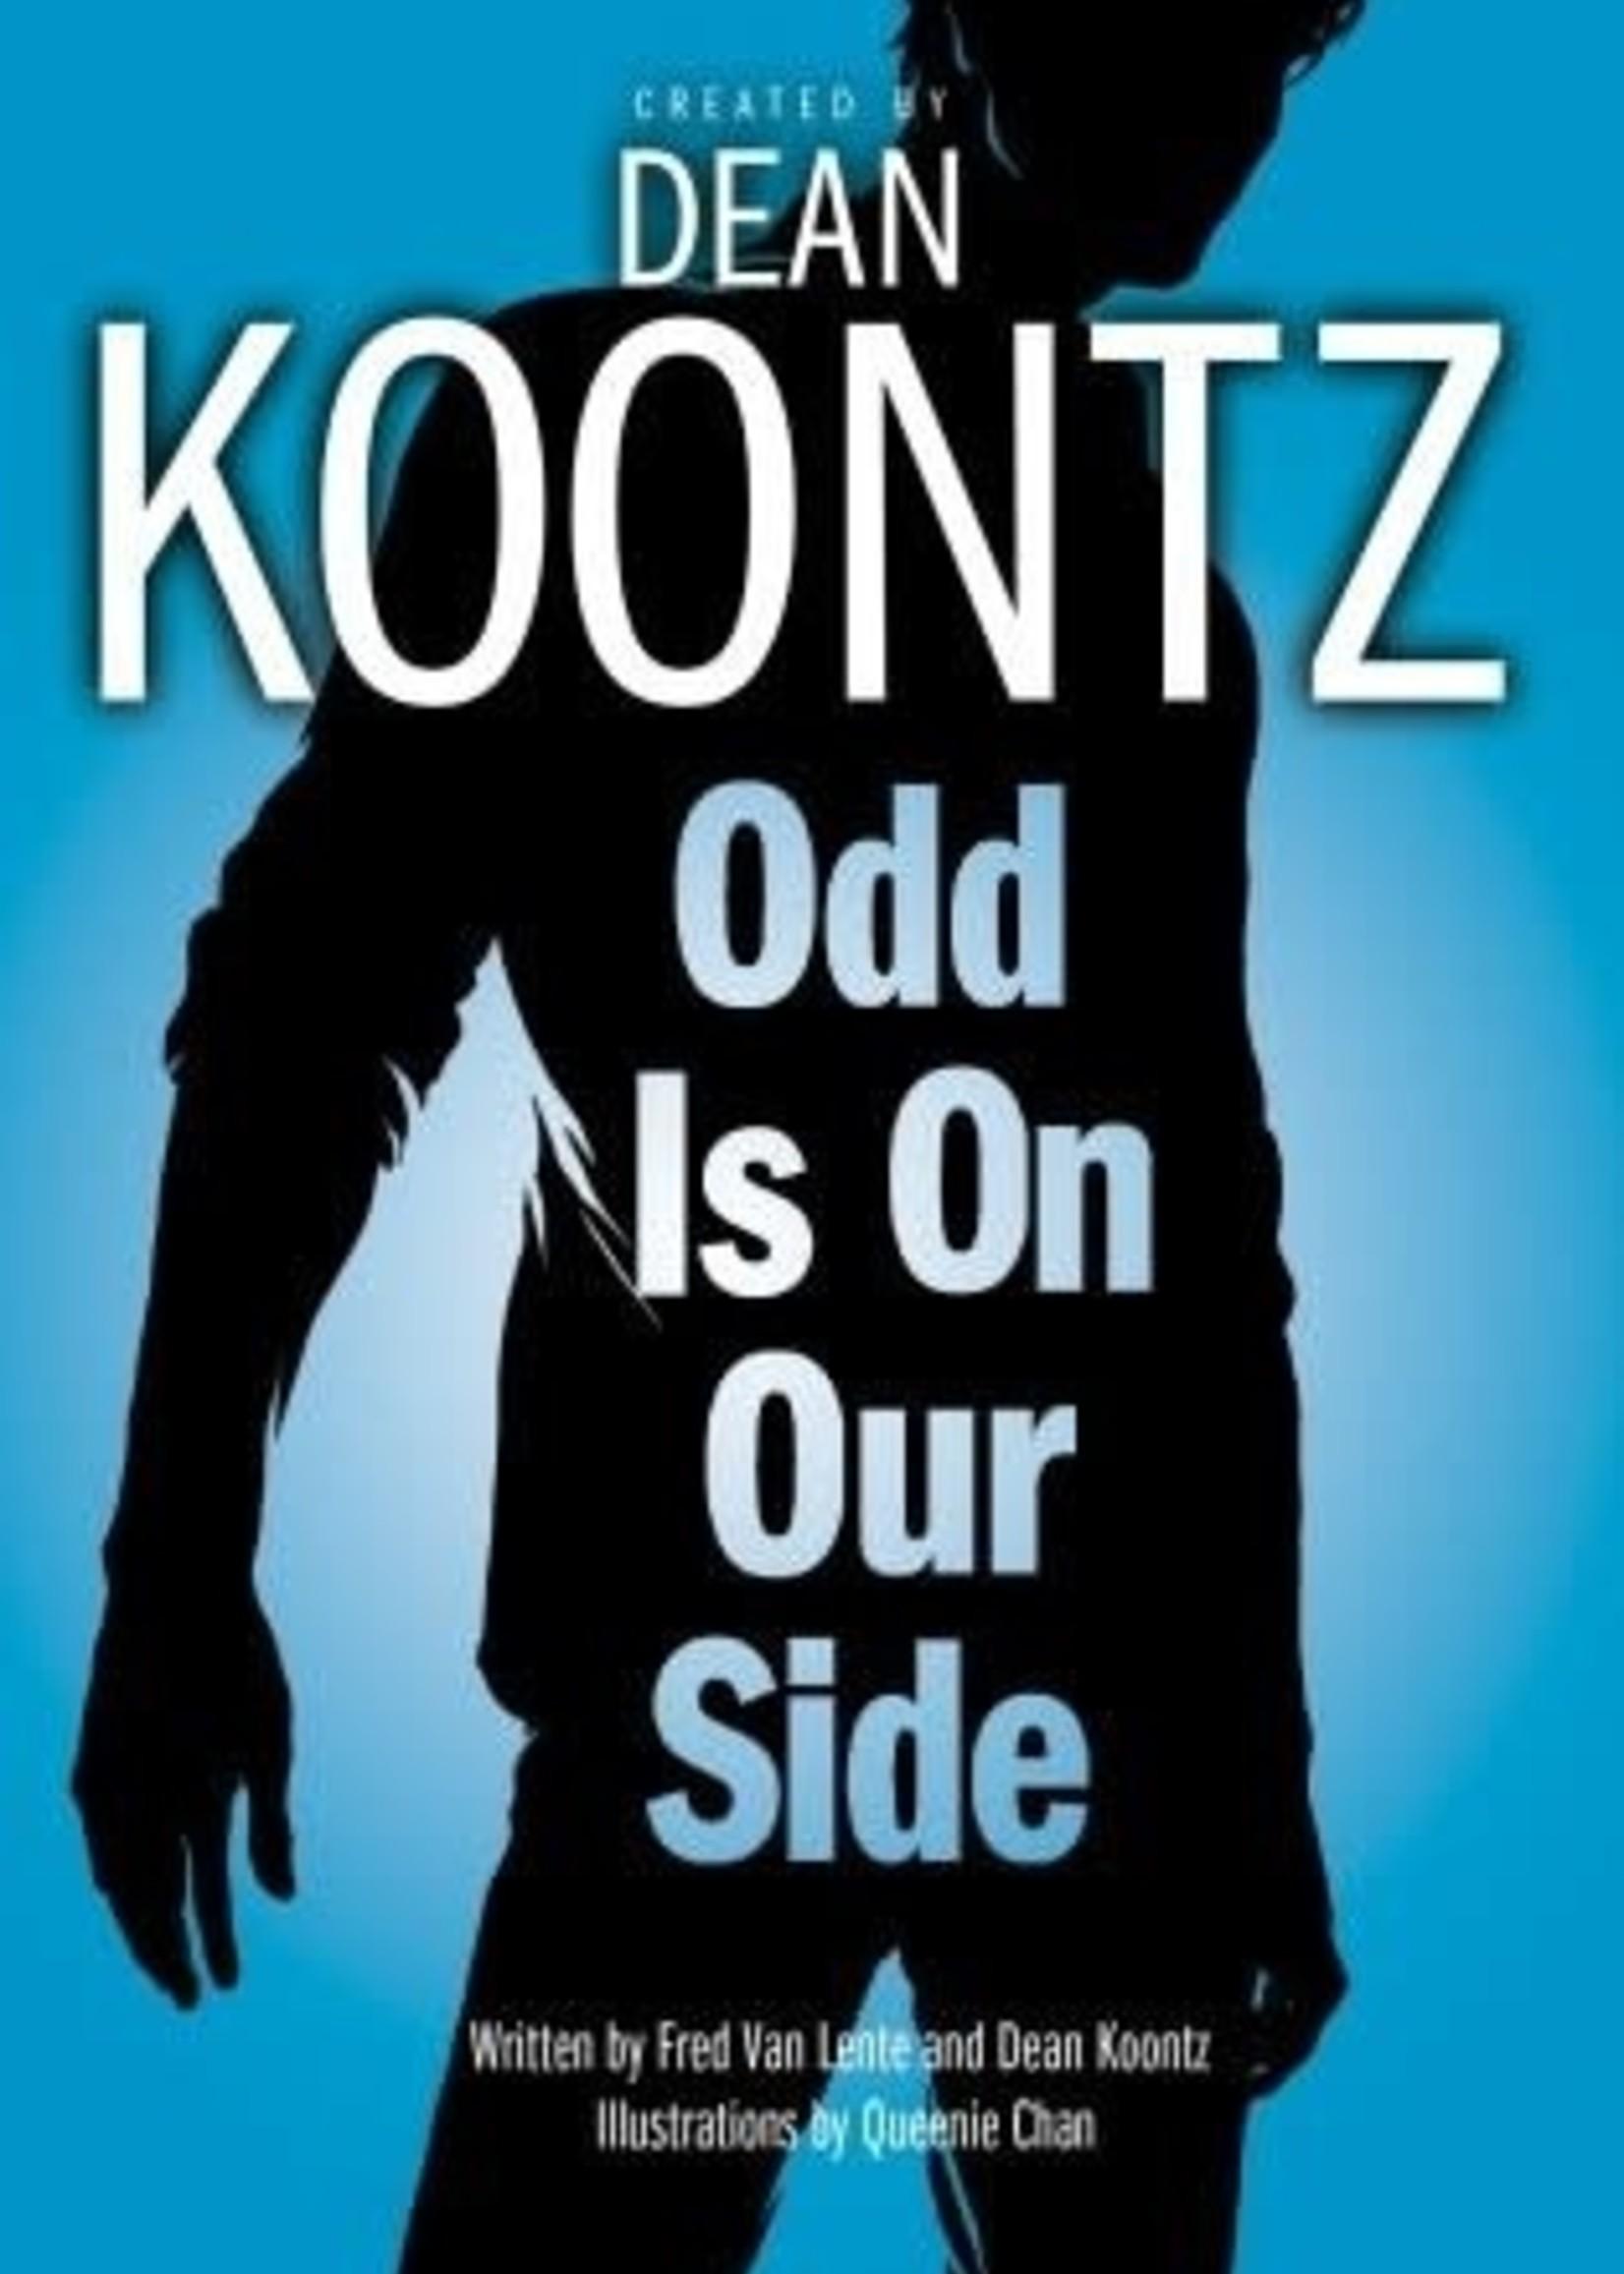 Odd Is on Our Side by Dean Koontz,  Fred Van Lente,  Queenie Chan